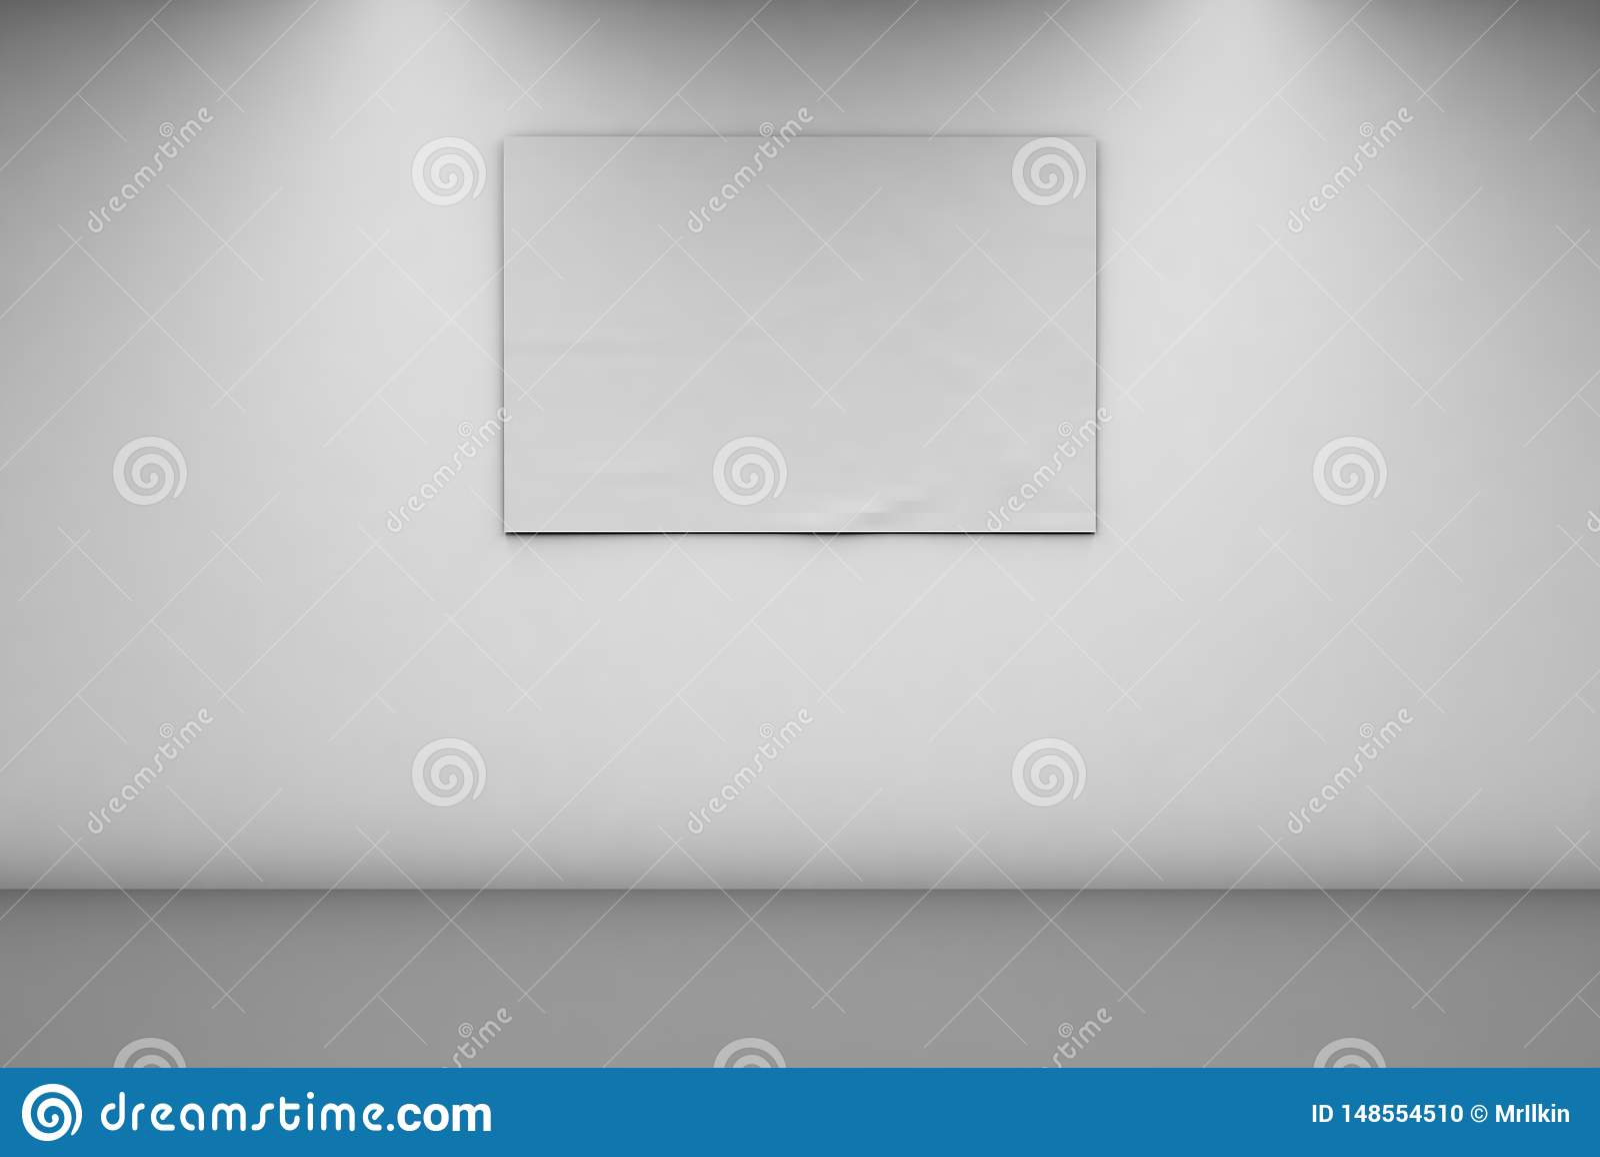 Insegne in bianco 2 x 3 su una parete bianca Insegna orizzontale in una stanza vuota 3d rappresentazione, vista frontale